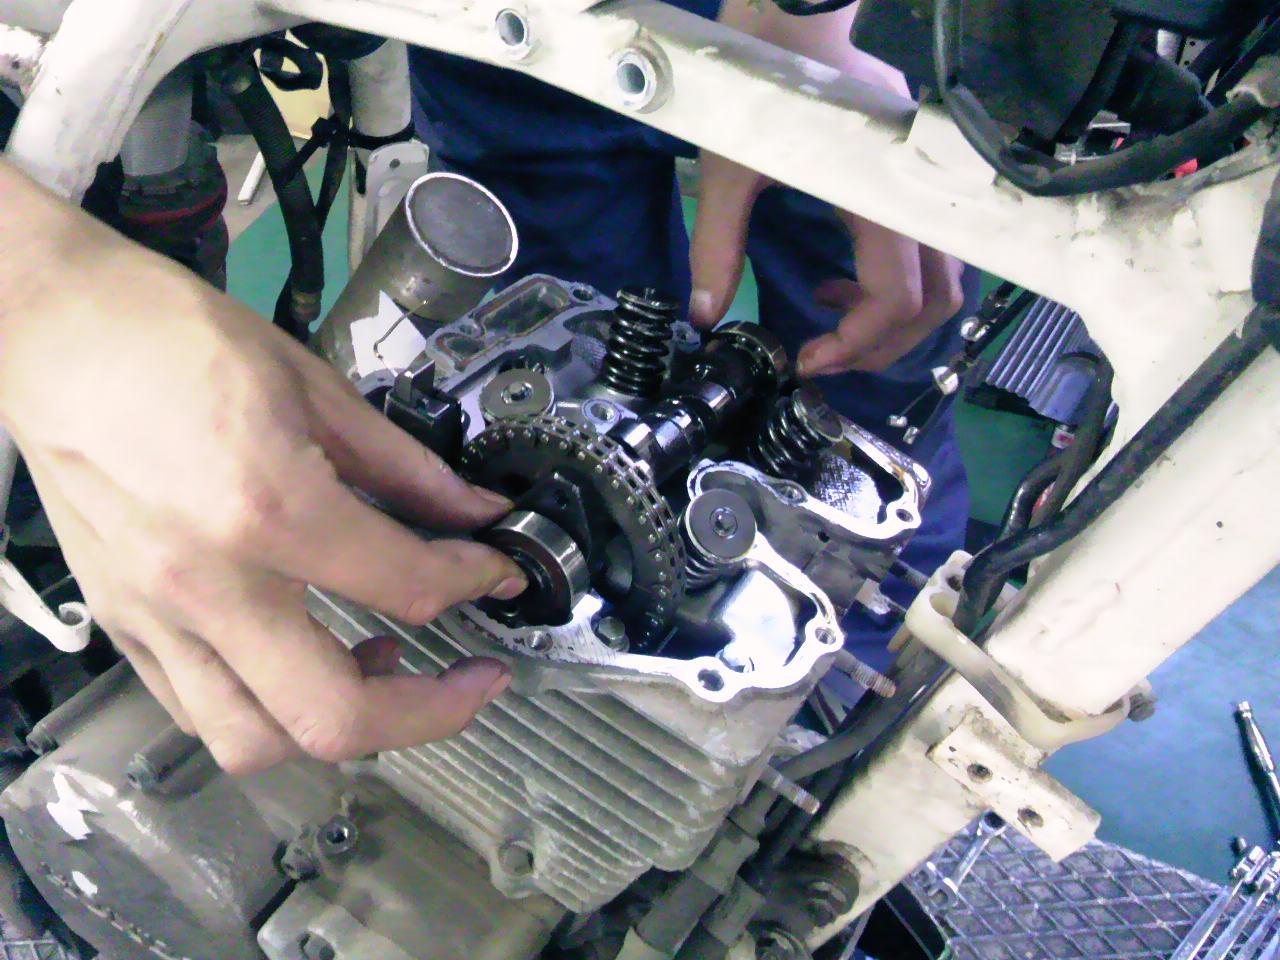 XR250Rエンジン分解!!_e0114857_22585835.jpg